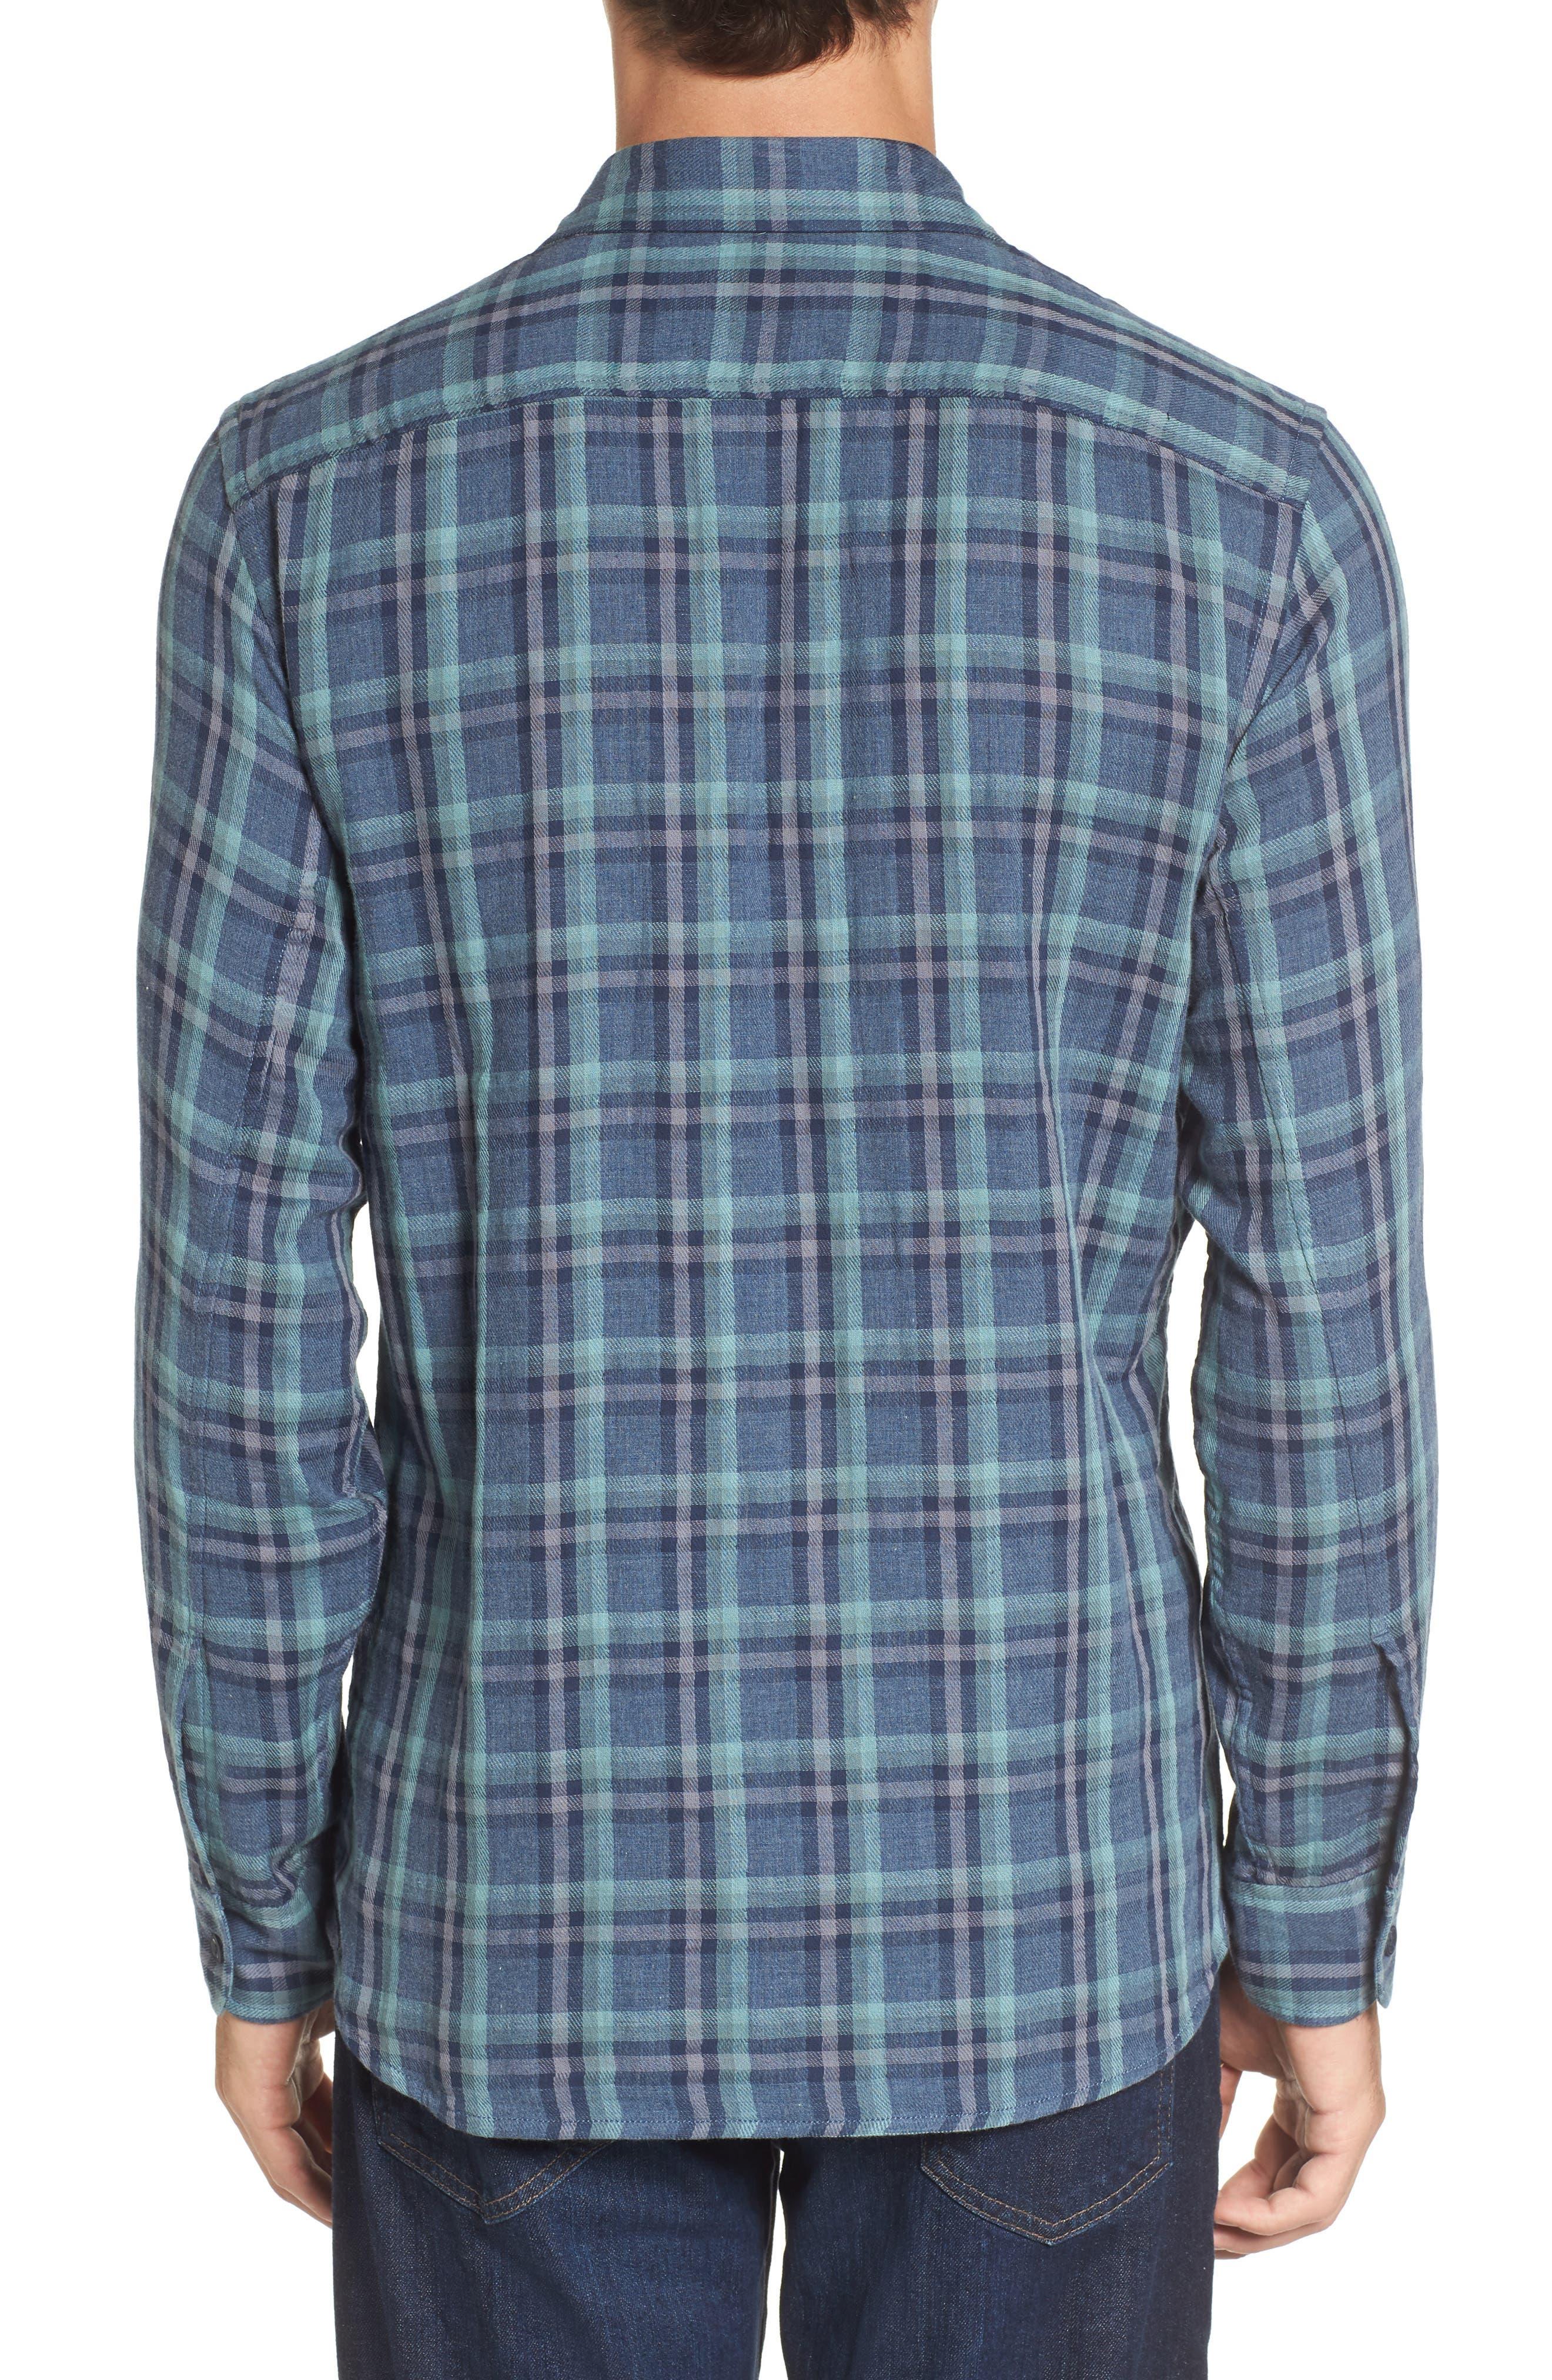 Smith Double Cloth Plaid Sport Shirt,                             Alternate thumbnail 2, color,                             Blue Navy Seafoam